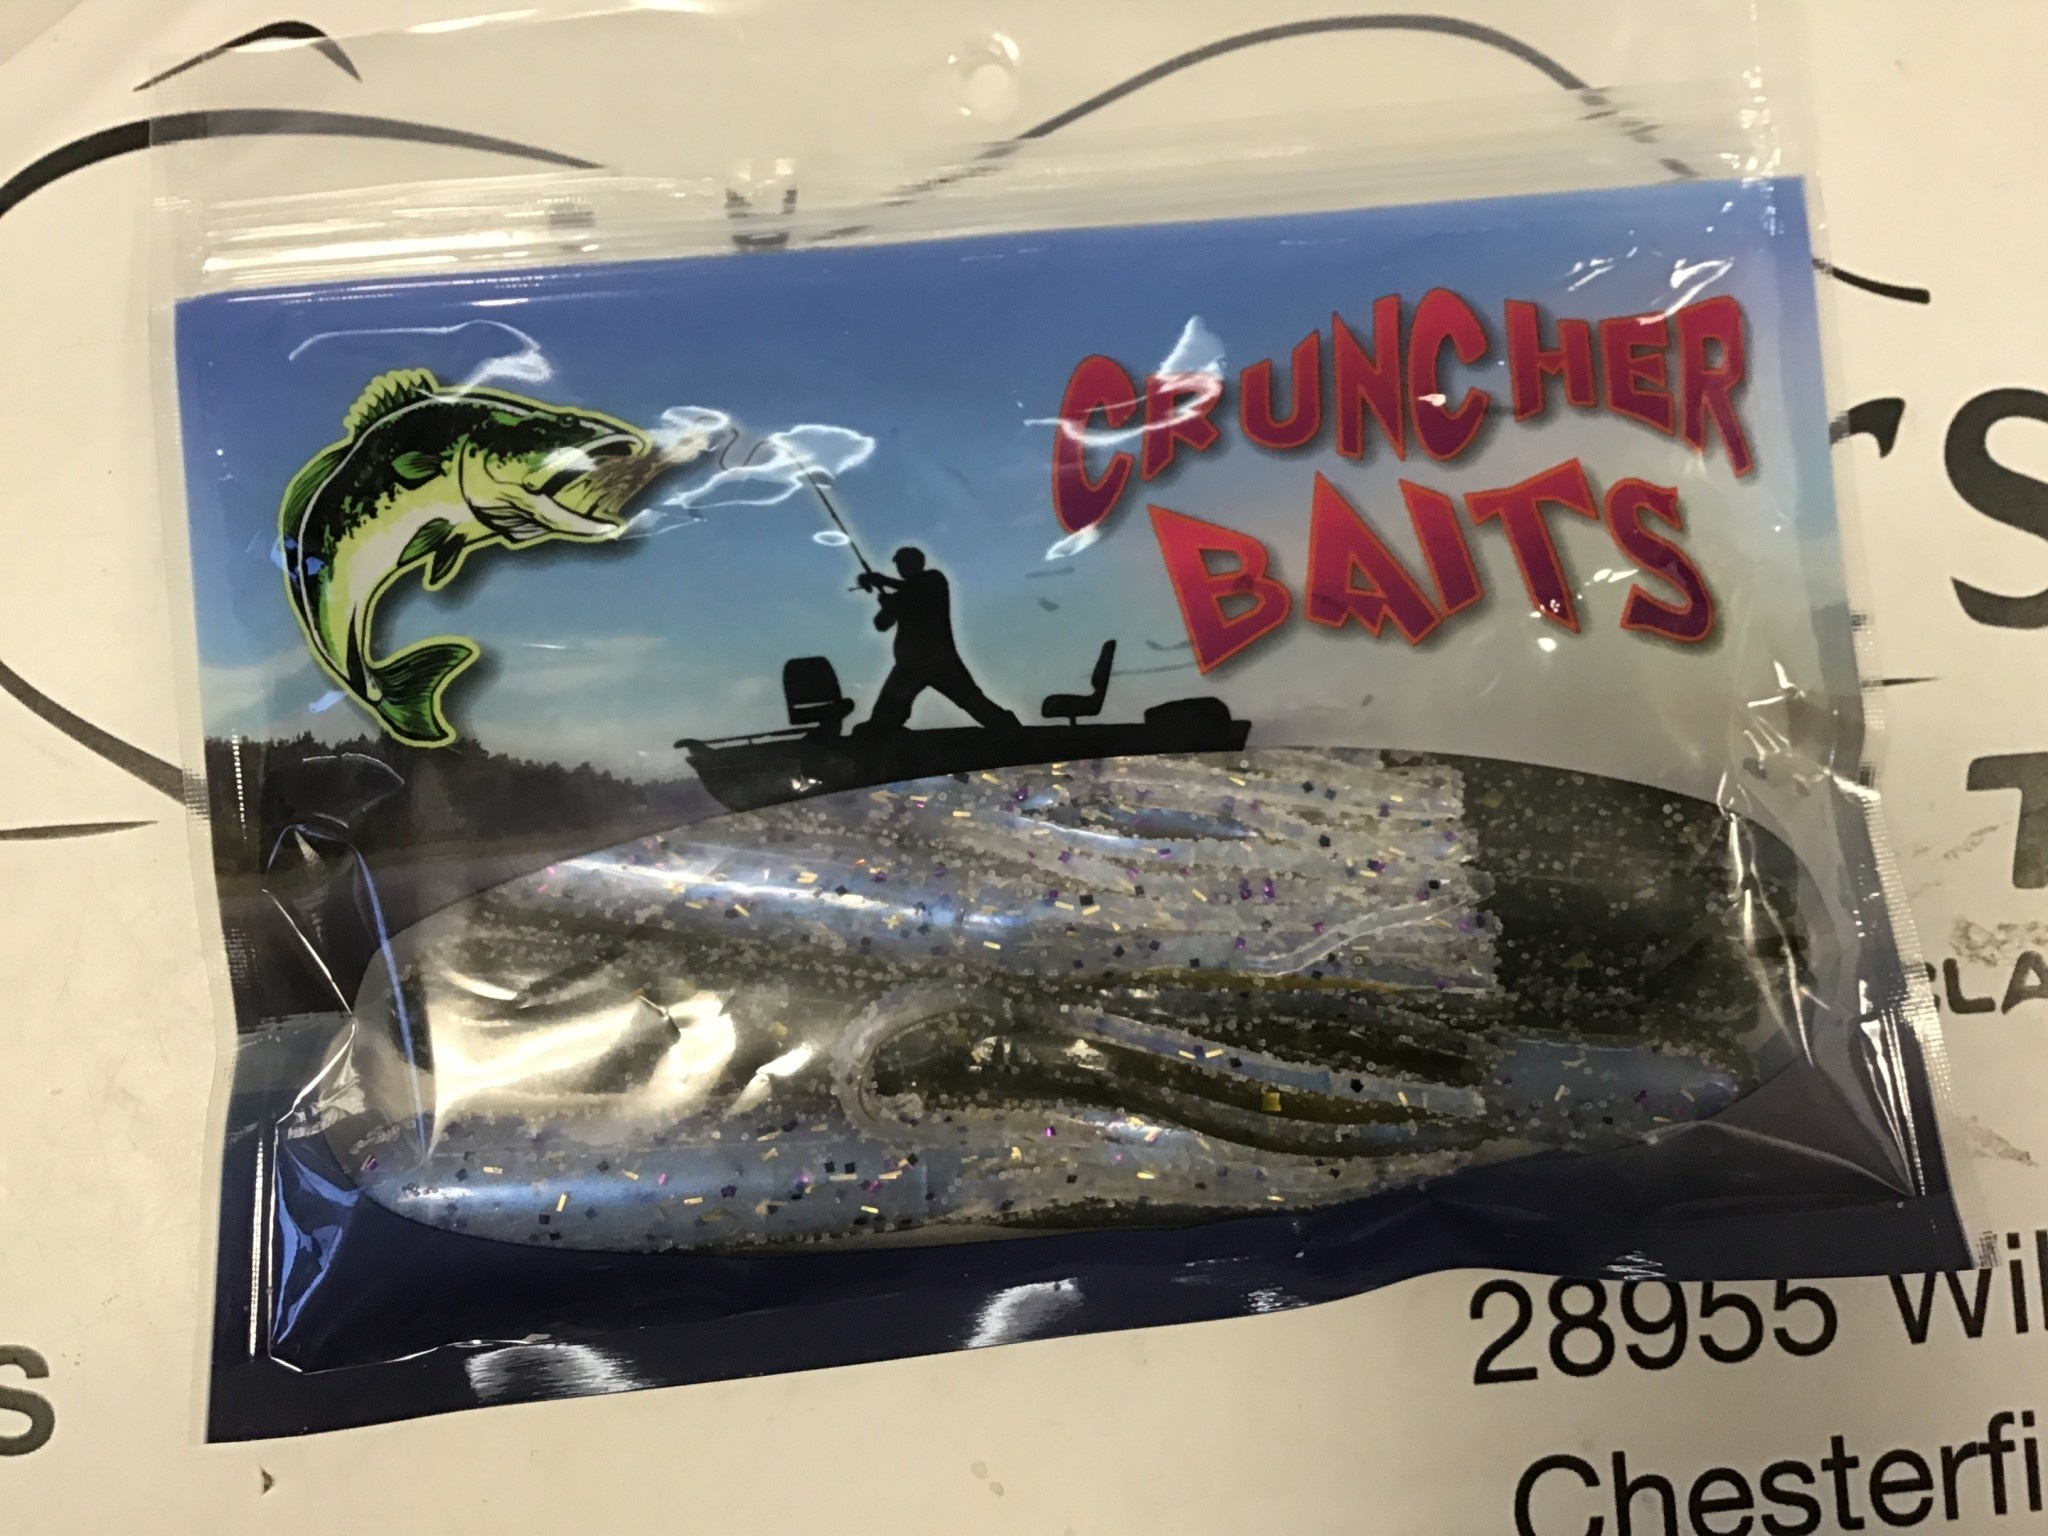 Cruncher Baits S & L Cruncher Bait Fried Goby